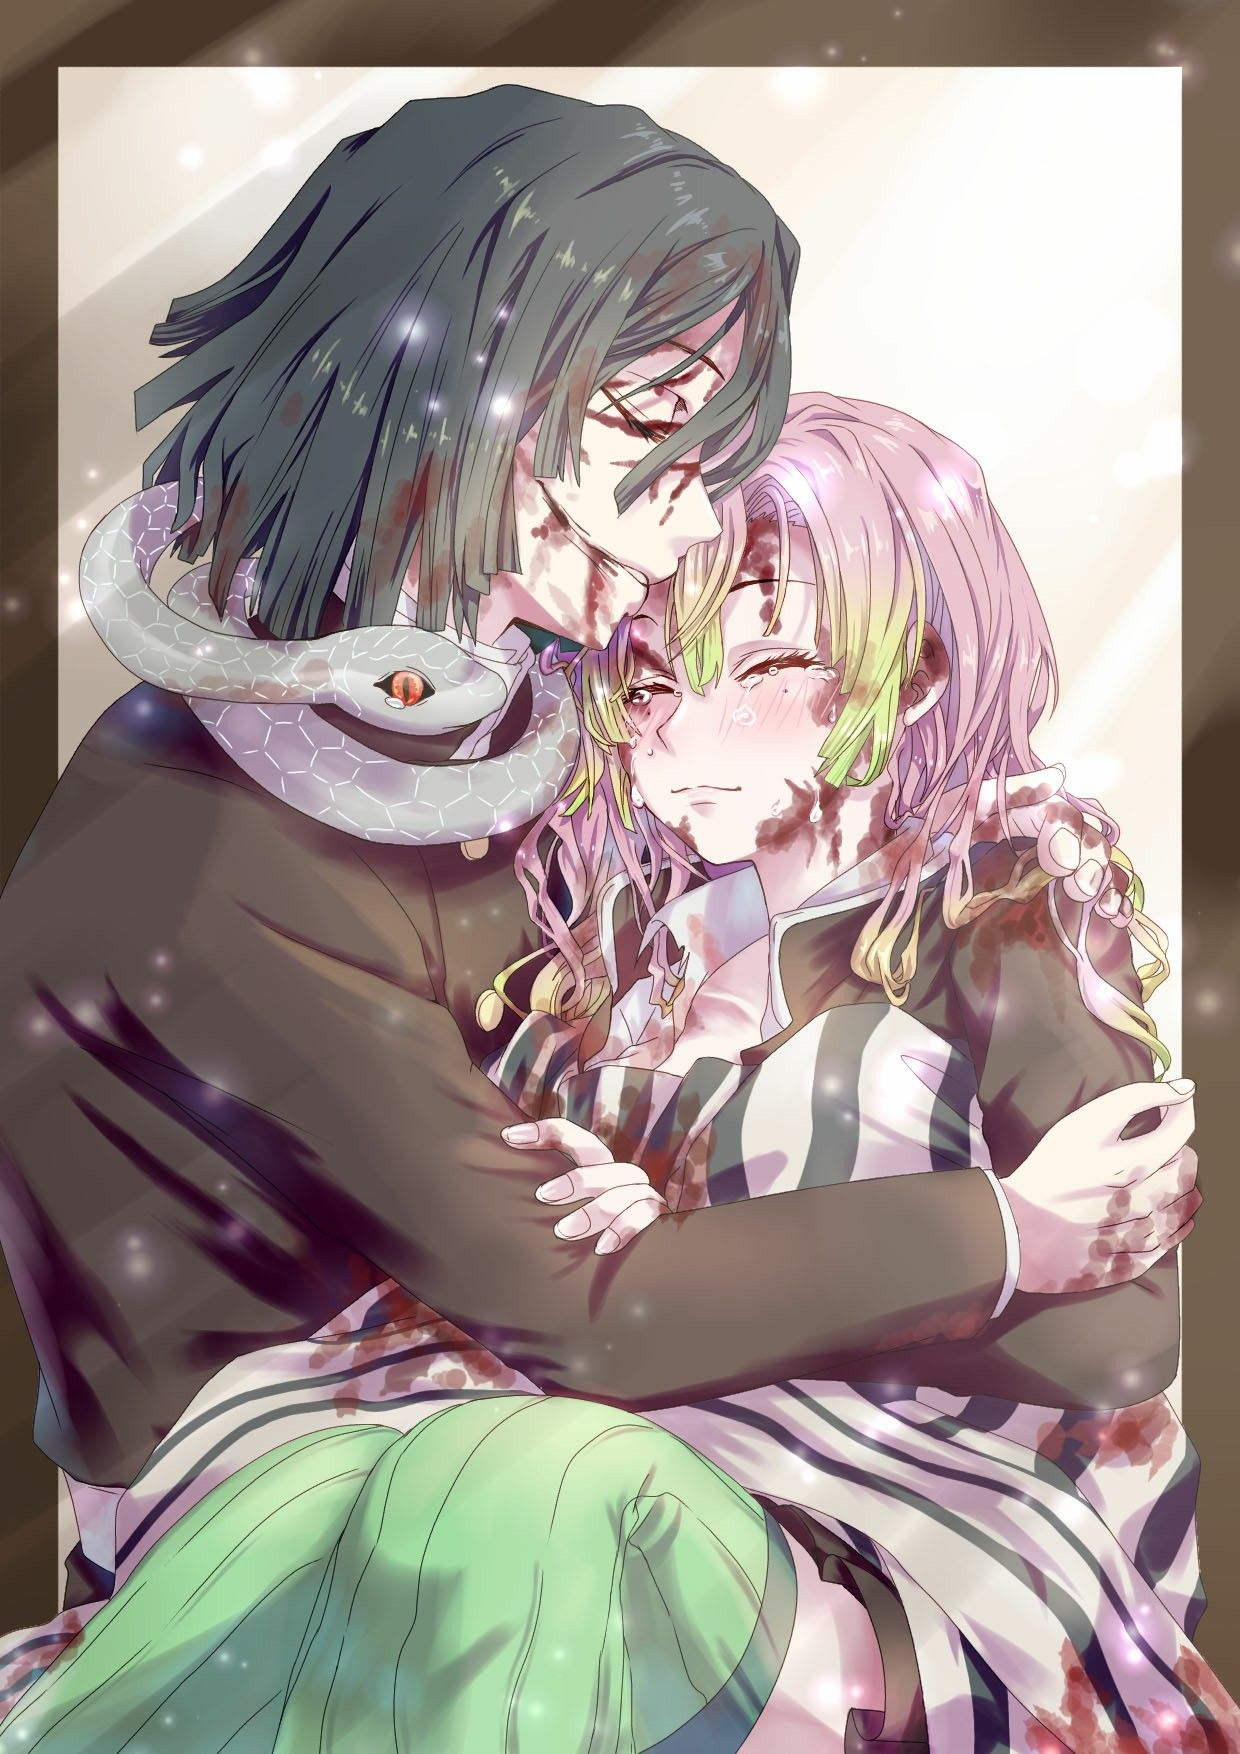 #anime #kimetsunoyaiba #kimetsunoyaibafanart #kimetsunoyaibaart #kimetsunoyaibaanime #鬼灭之刃